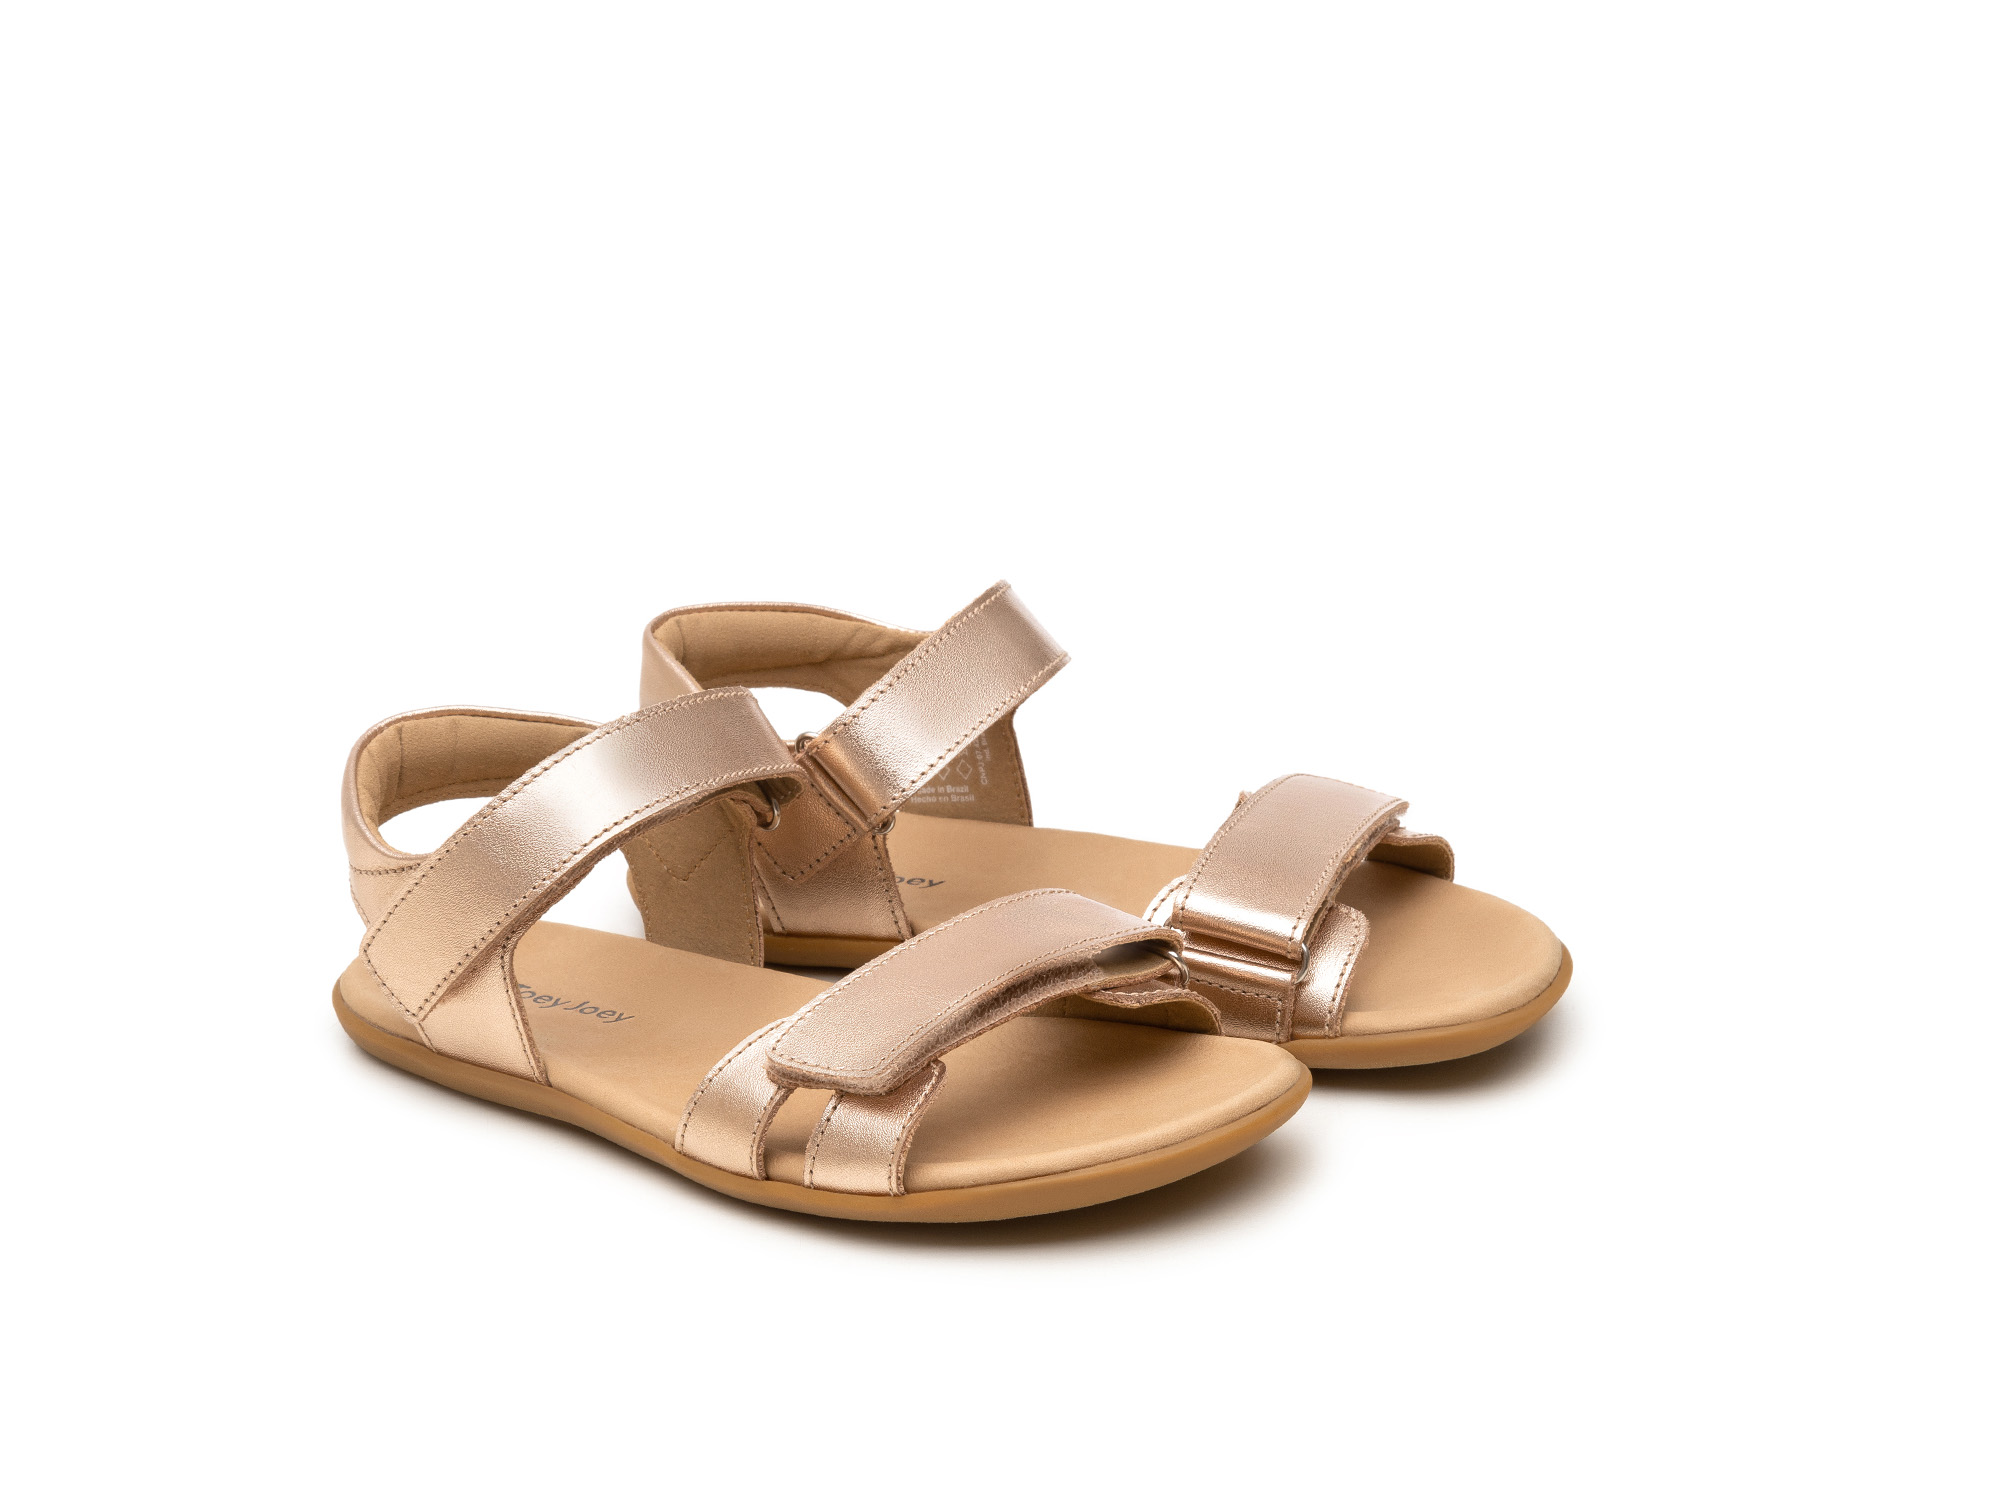 Sandália infantil feminino spring